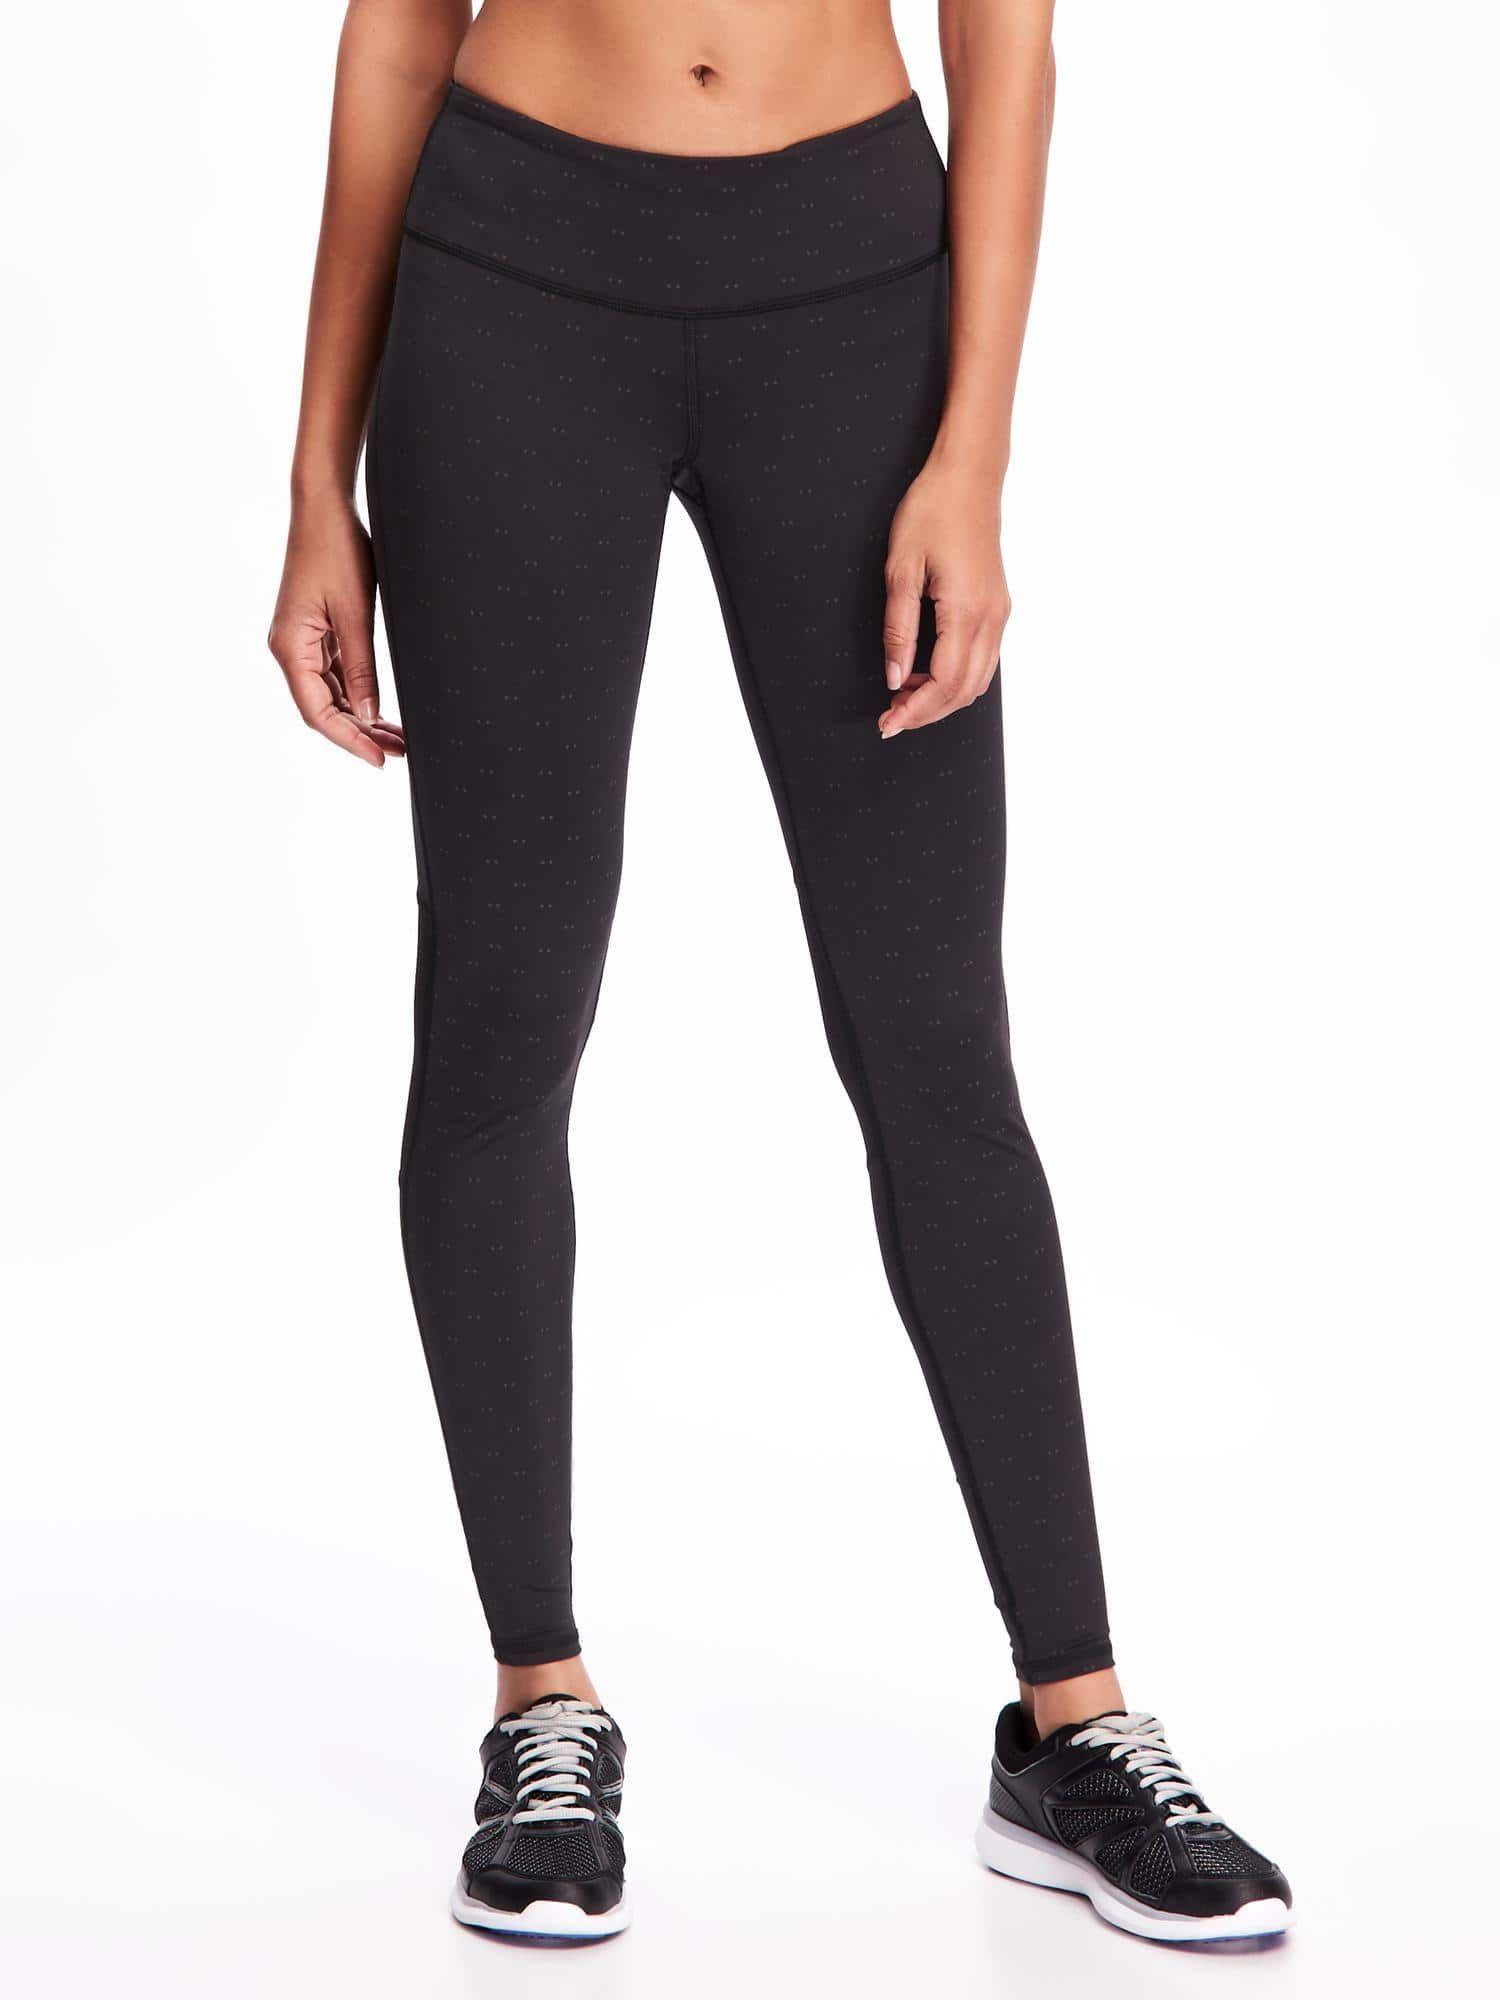 medium, tall, 15 Active wear for women, Maternity wear